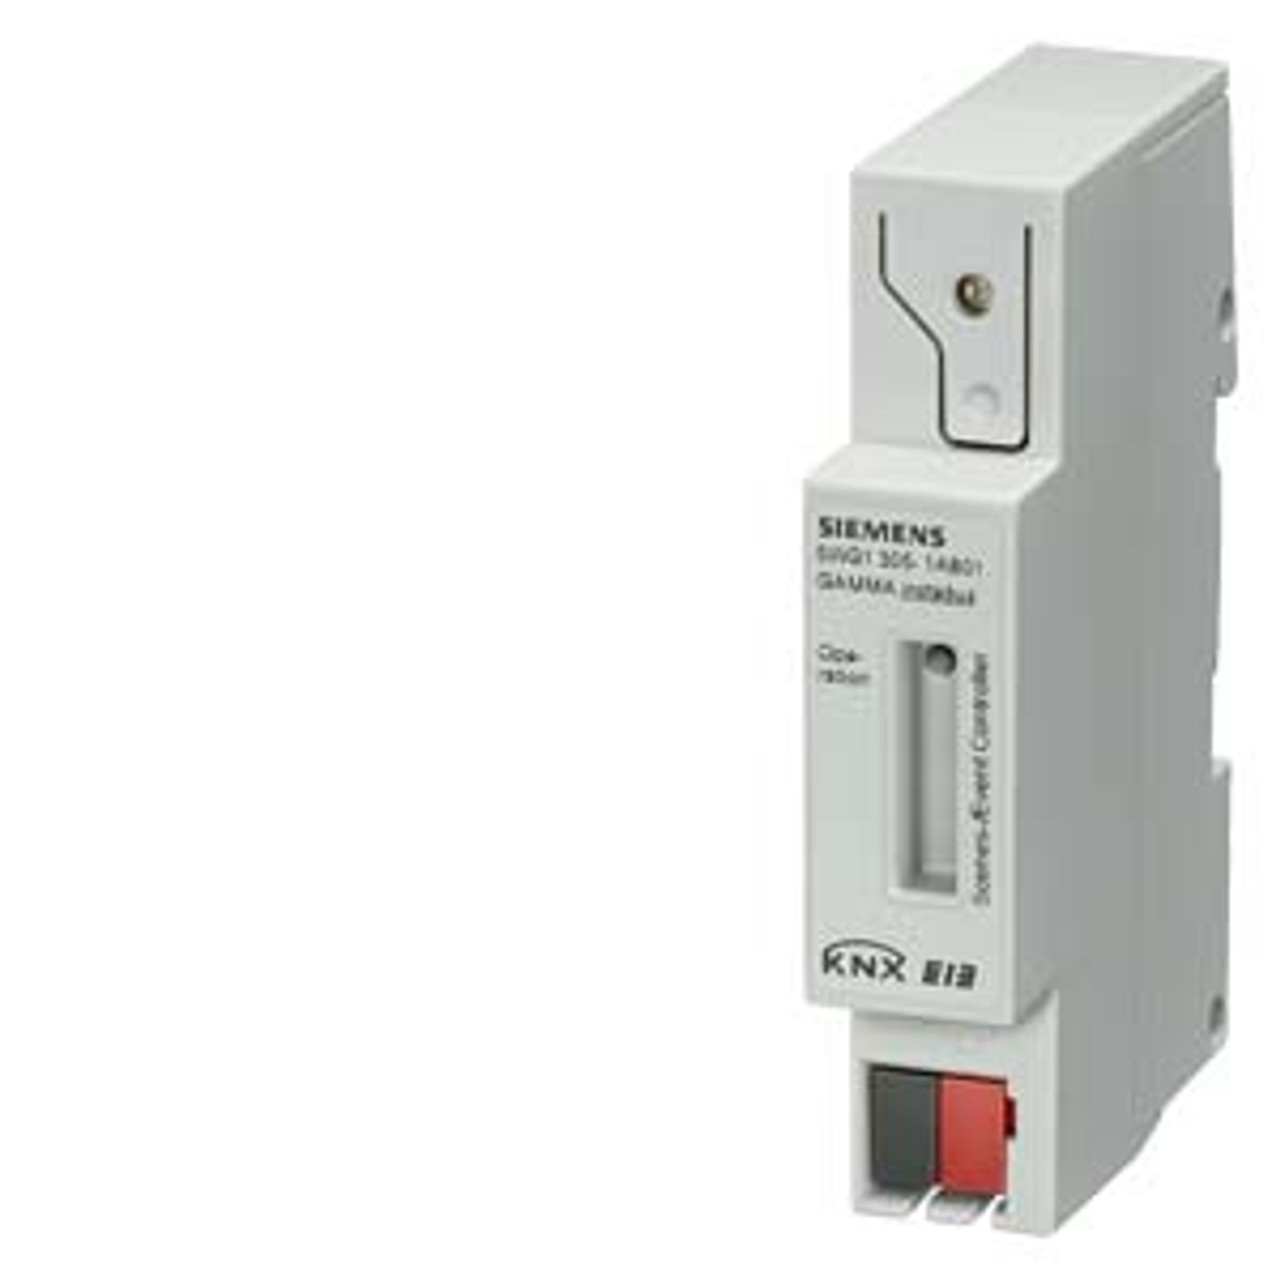 Siemens 5WG1305-1AB01